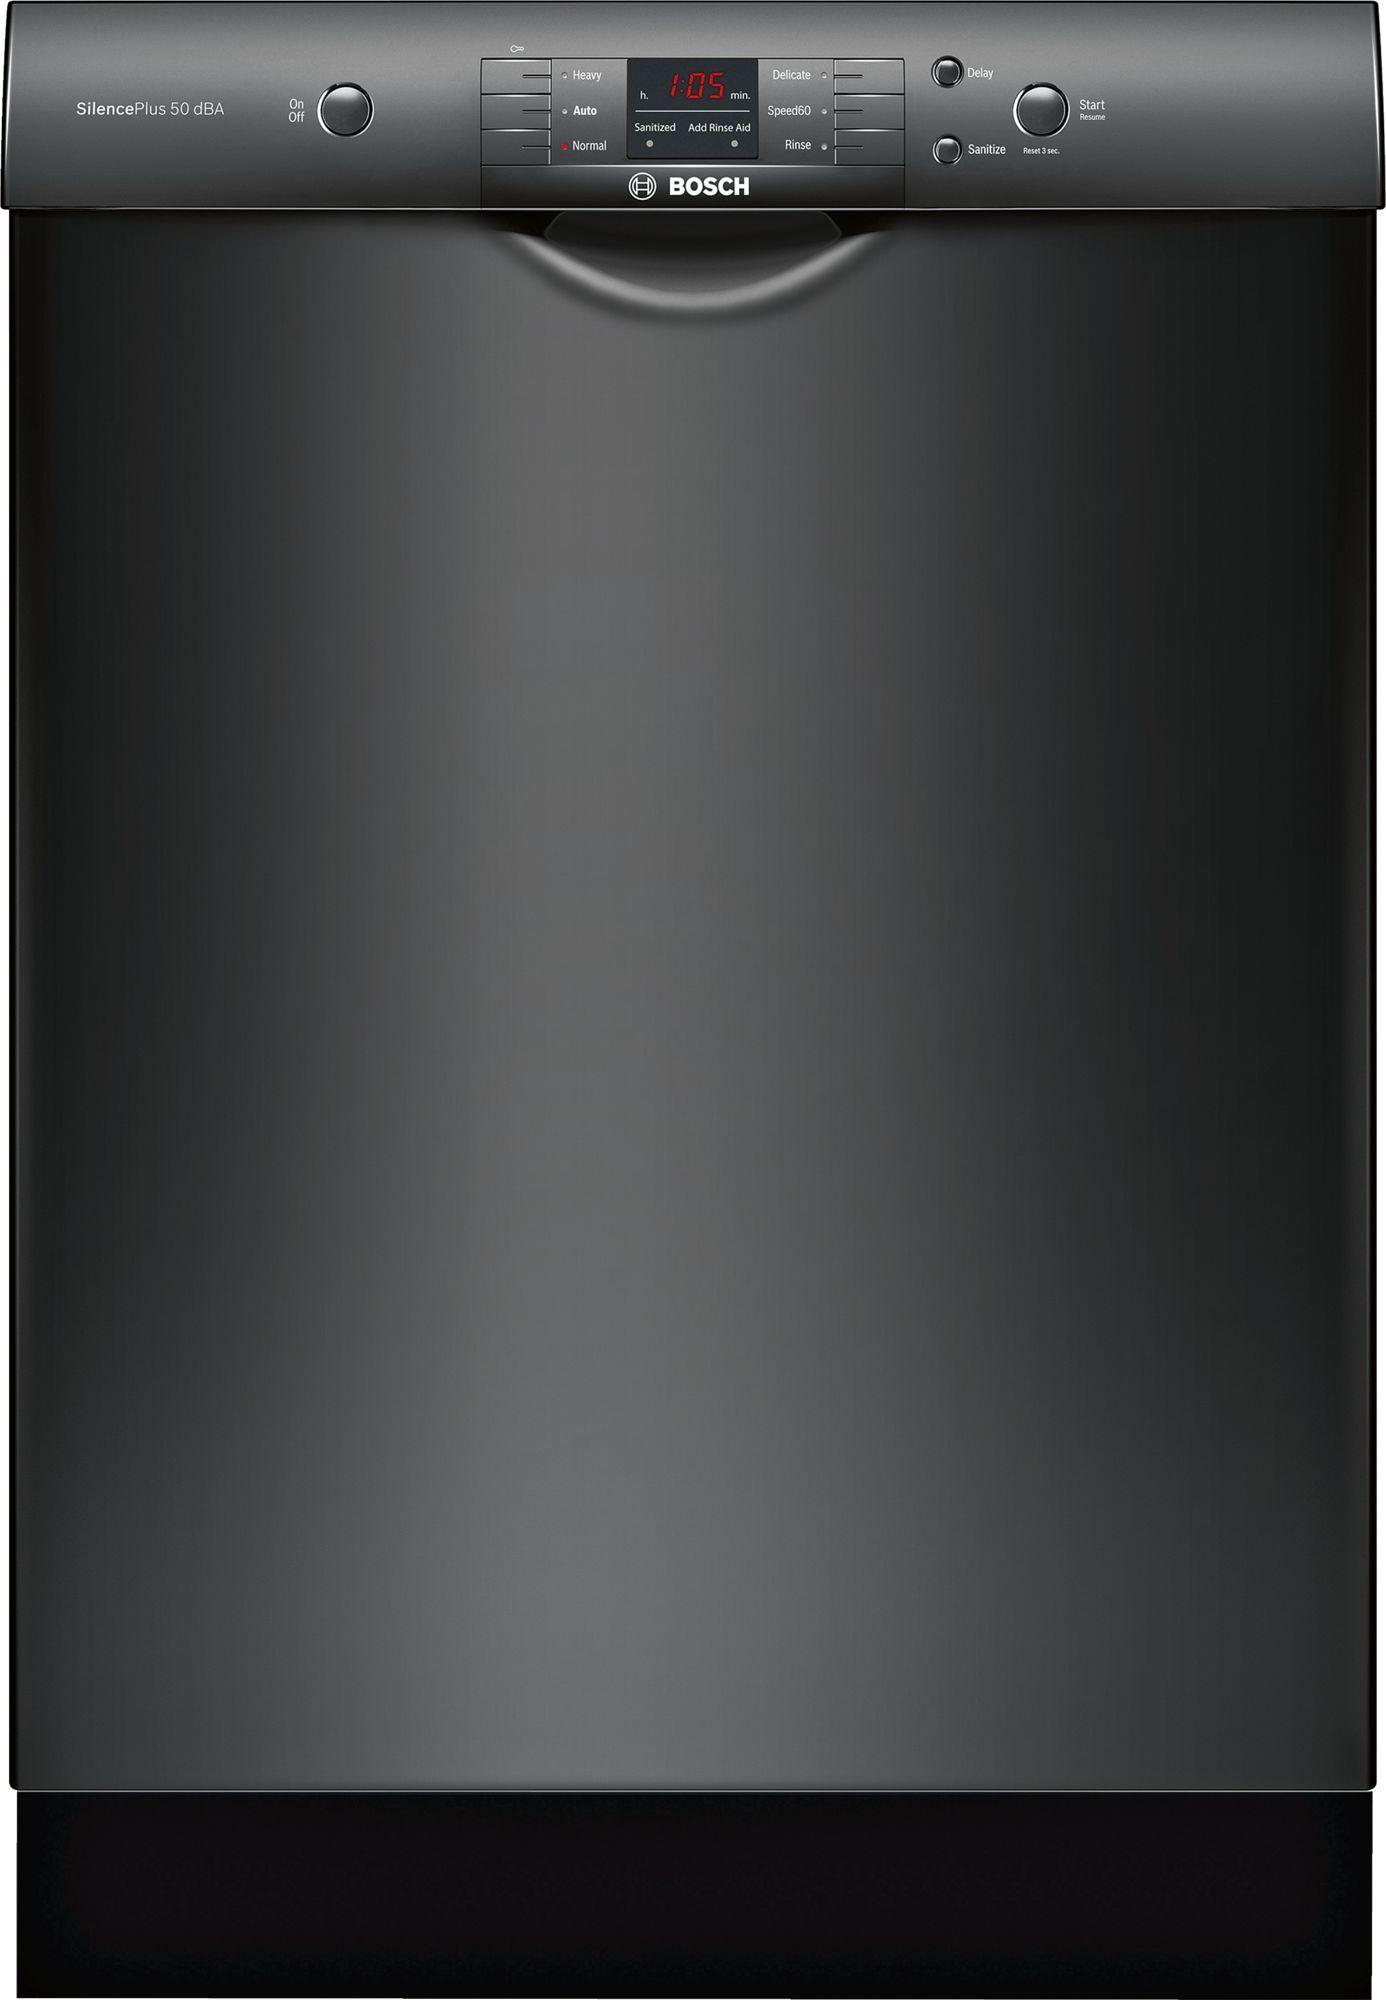 Bosch 100 Series Dishwasher Black Black Dishwasher Built In Dishwasher Dishwasher Installation